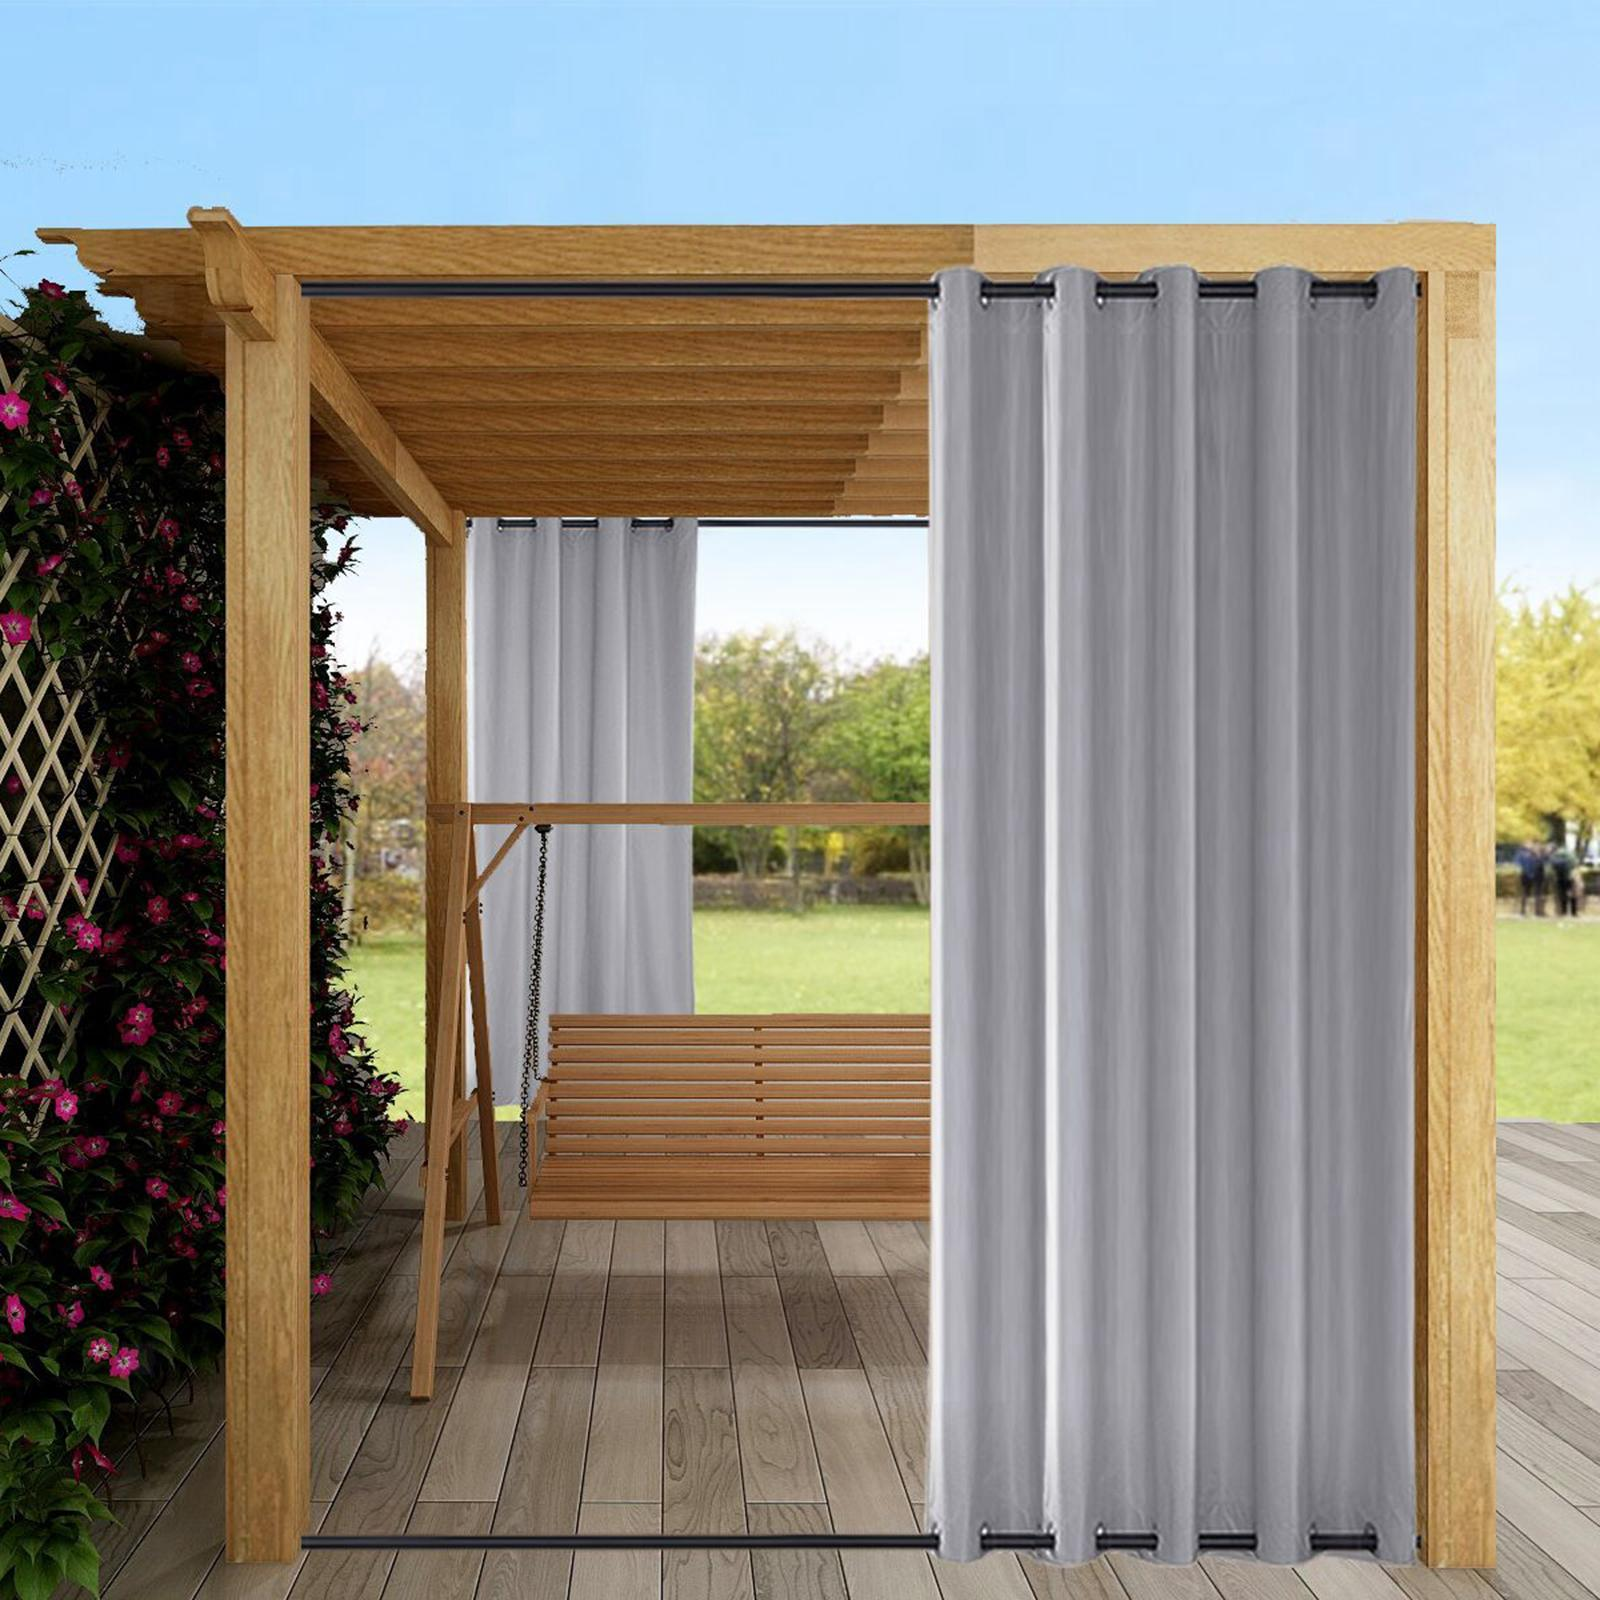 Terrasse vorhang outdoor drape wärme isolierte veranda pavillon ...